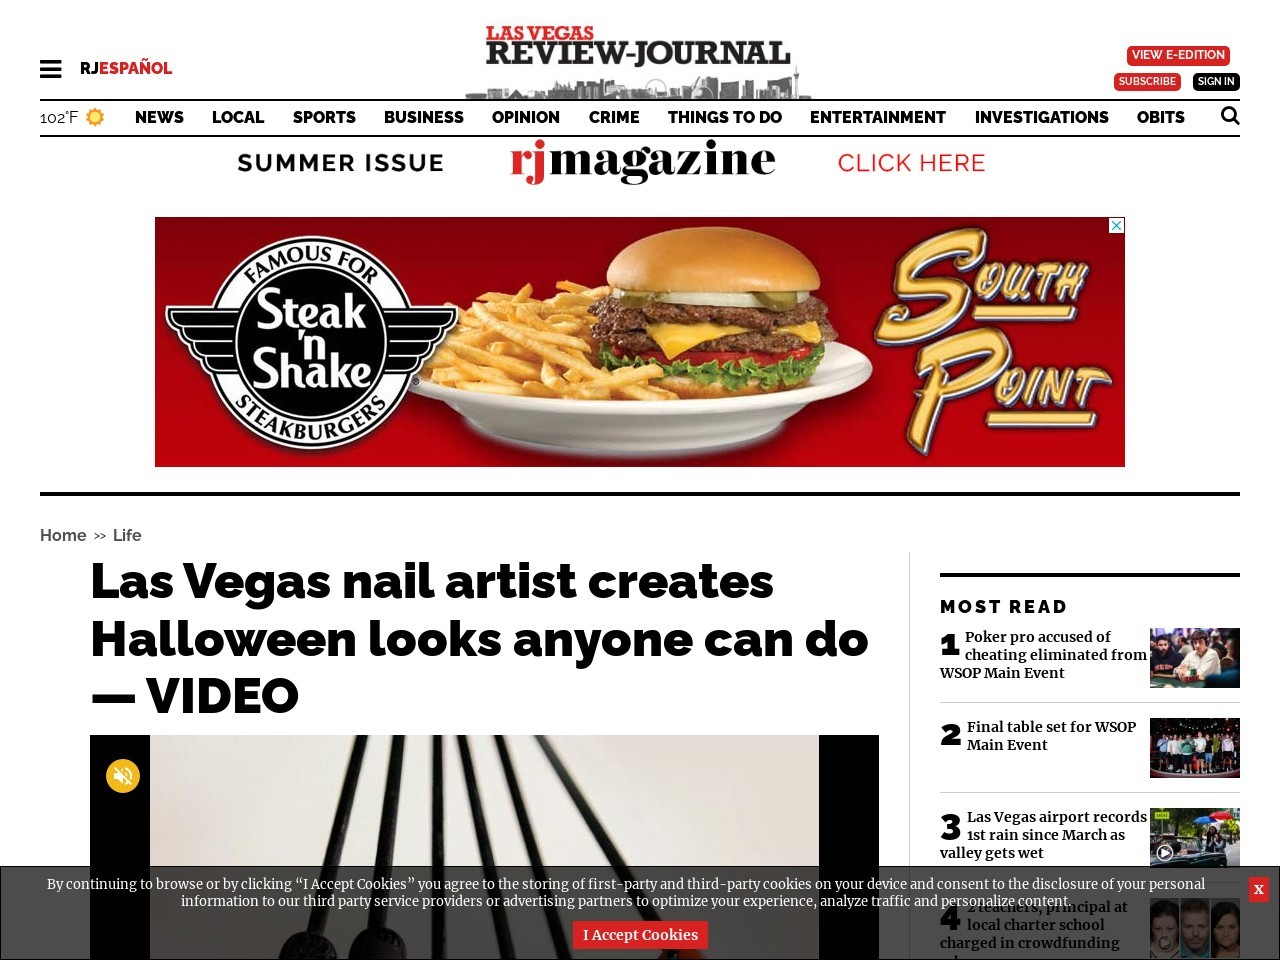 Las Vegas nail artist creates Halloween looks anyone can do — VIDEO